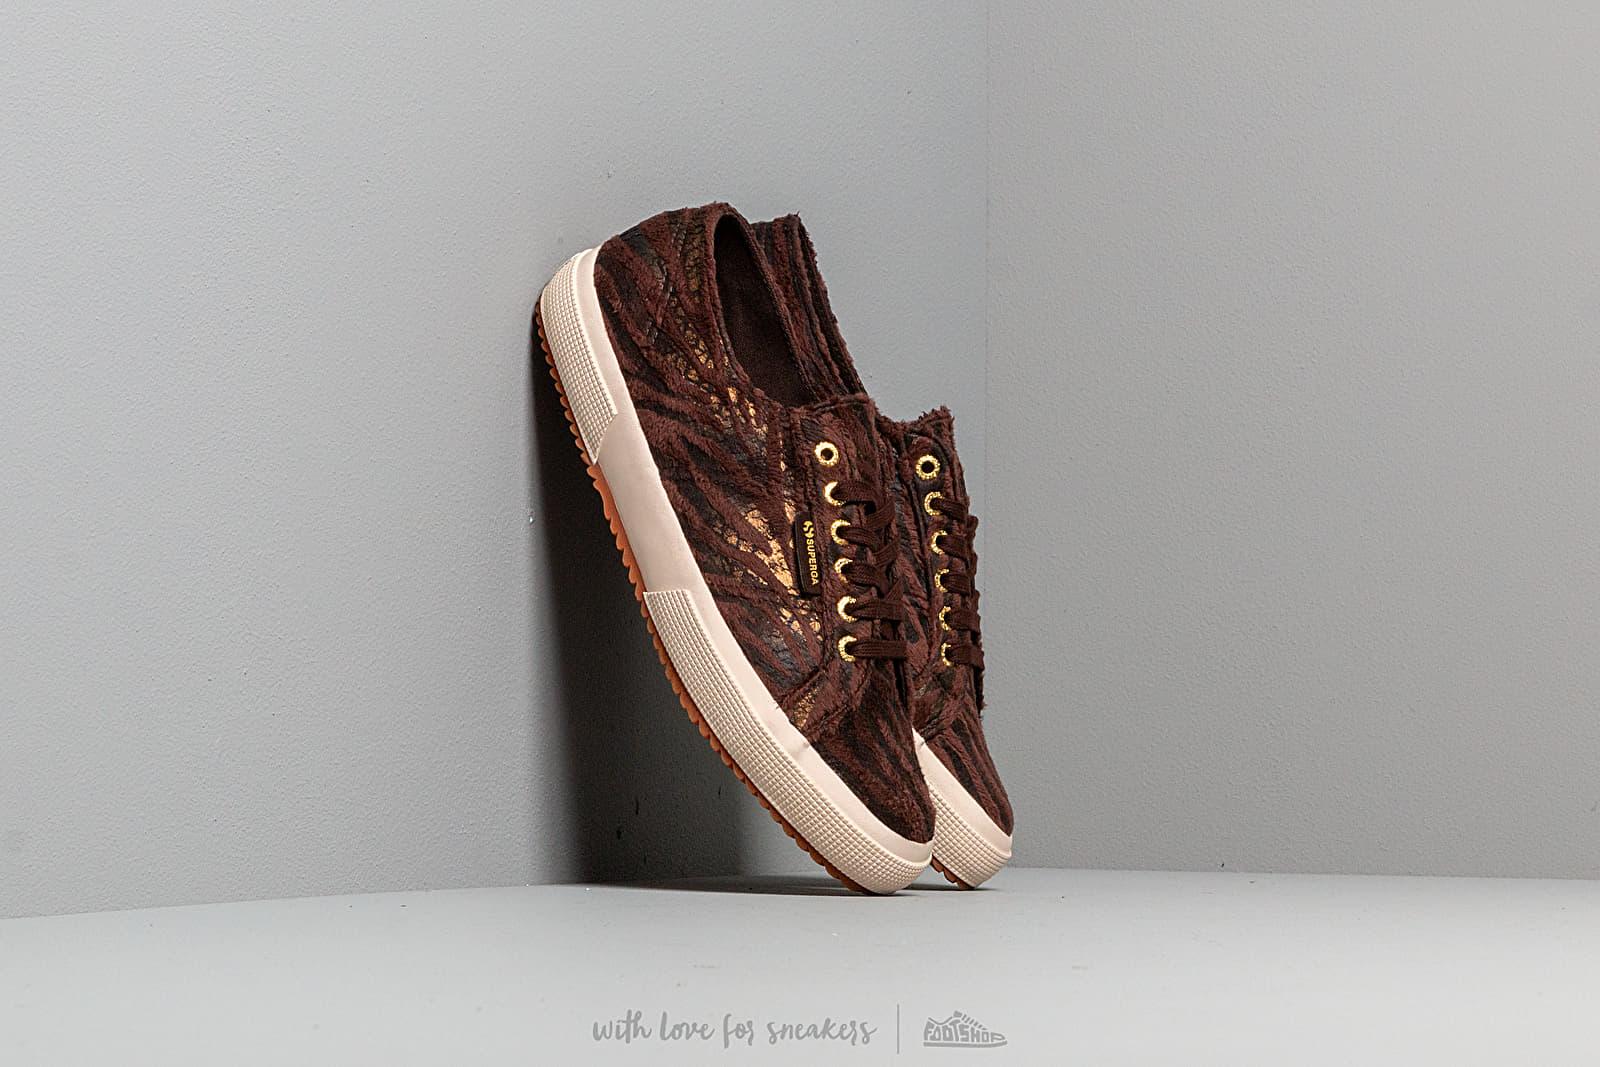 Superga 2750 Fabric Synthetic Zebra W Brown-Bronze za skvelú cenu 33 € kúpite na Footshop.sk